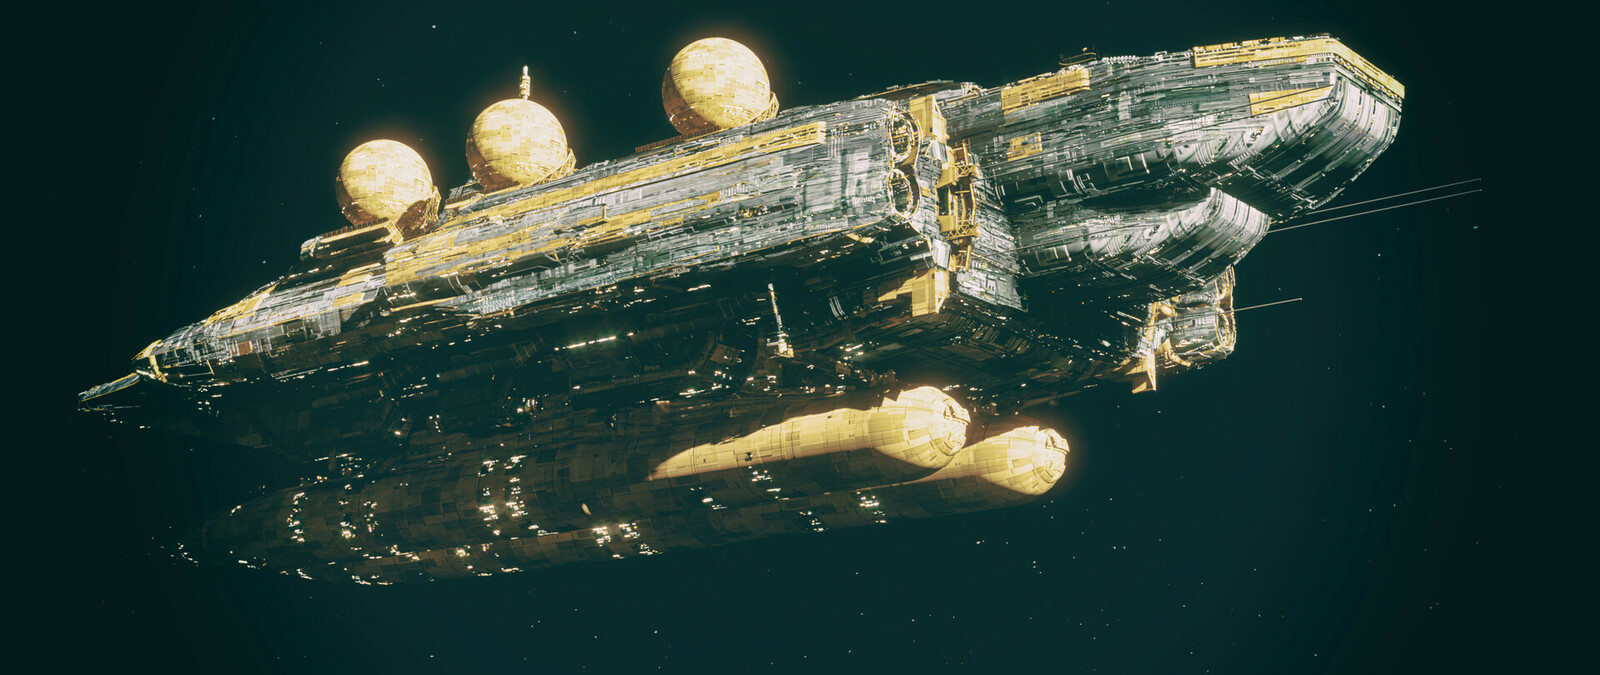 UNS Ticonderoga missile barge